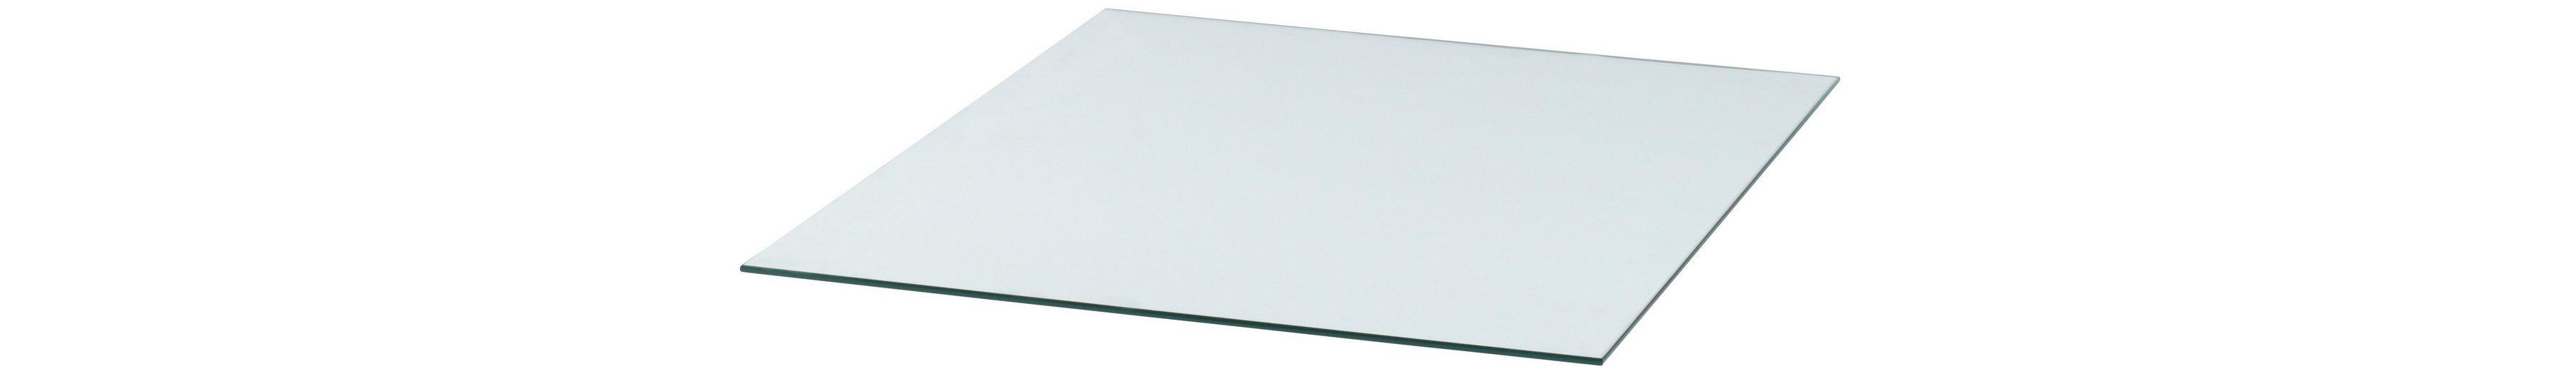 Glasbodenplatte »Rechteck«, 85 x 100 cm, transparent, zum Funkenschutz